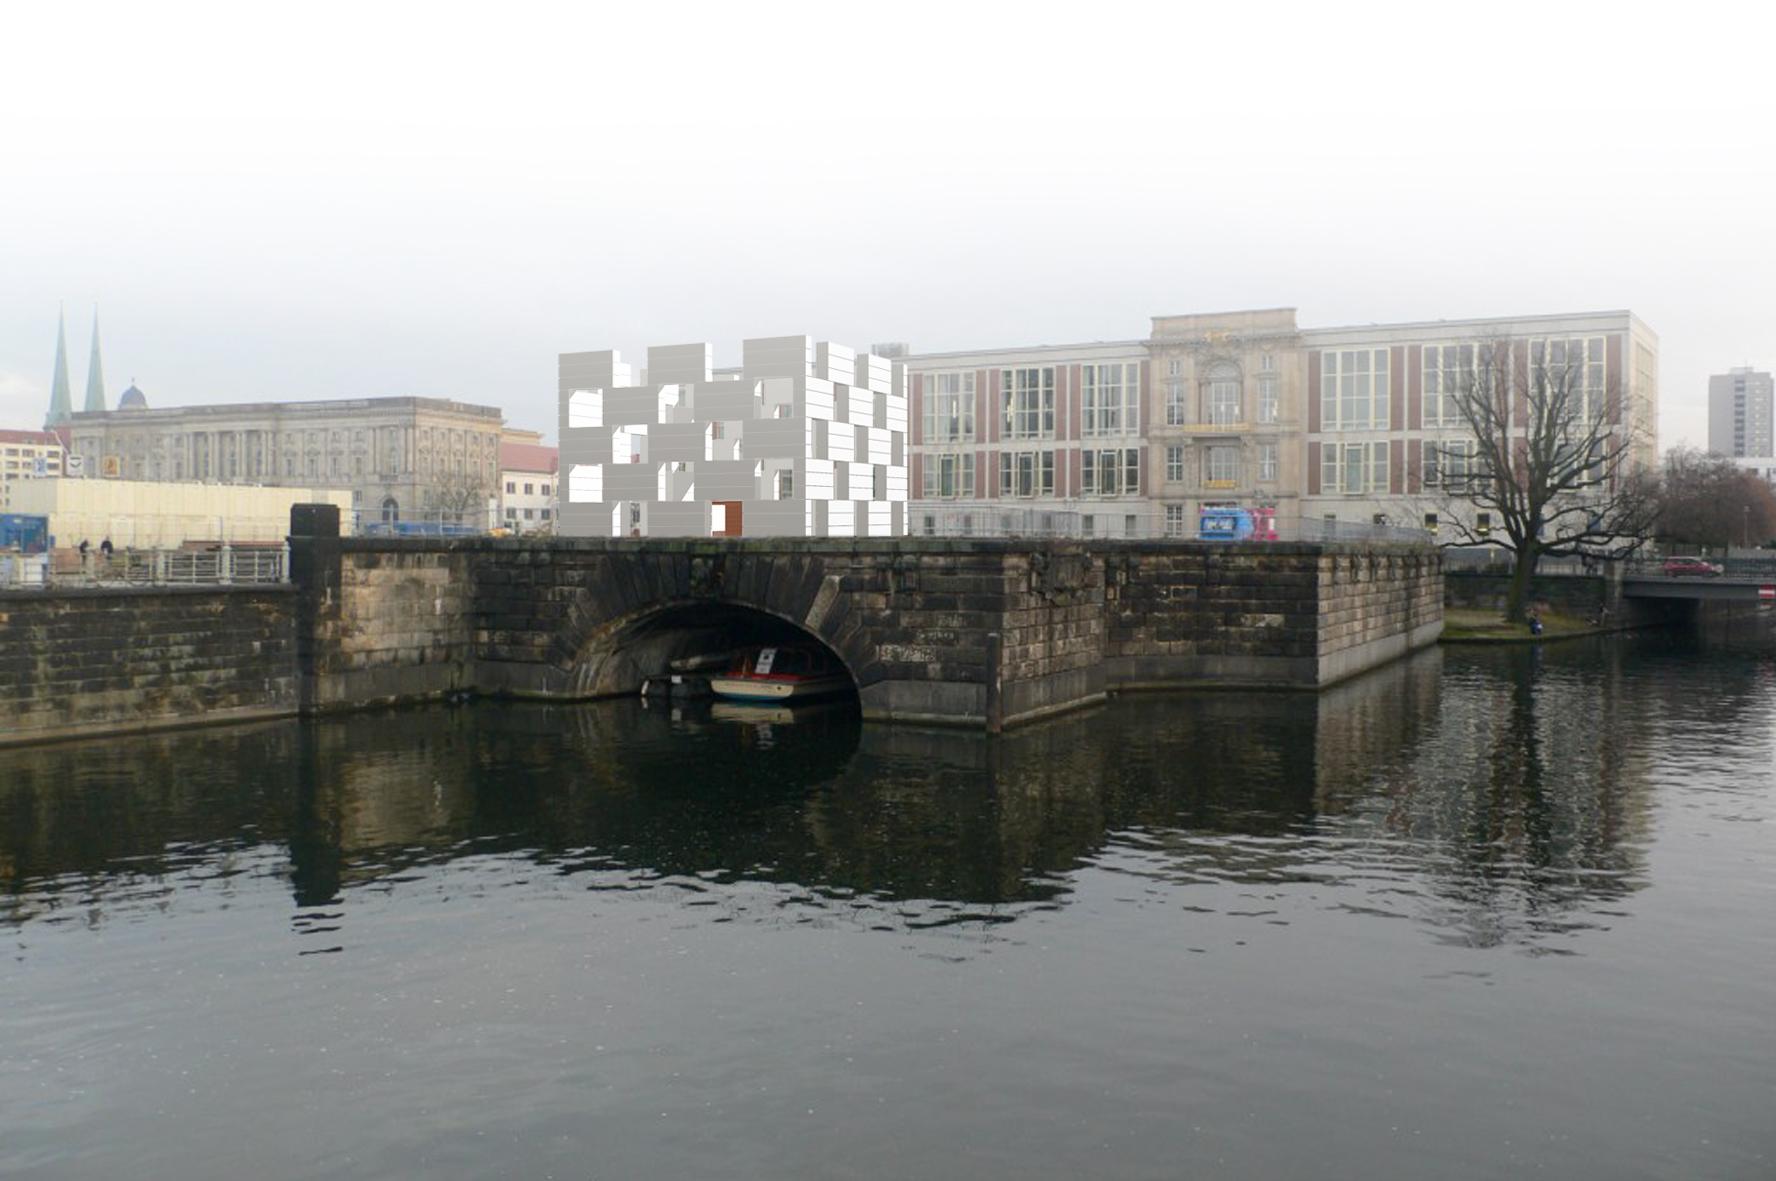 Einheitsdenkmal Berlin